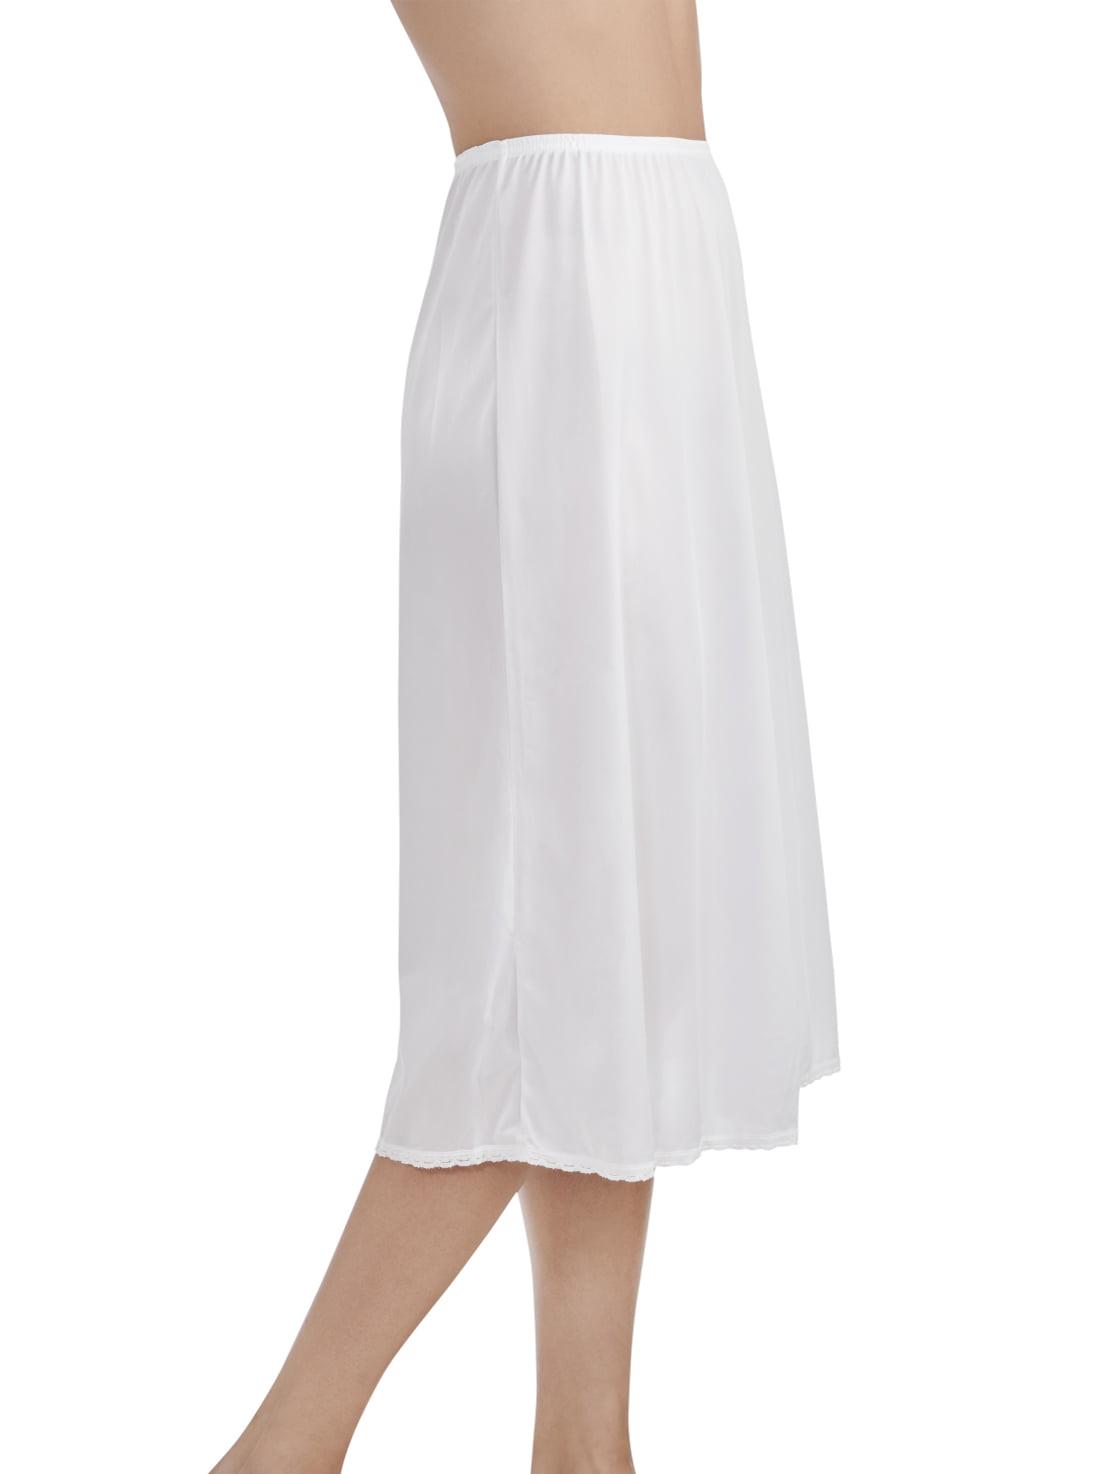 "Vanity Fair Daywear Solutions 100/% Nylon Black Half Slip Size Medium Length 18/"""